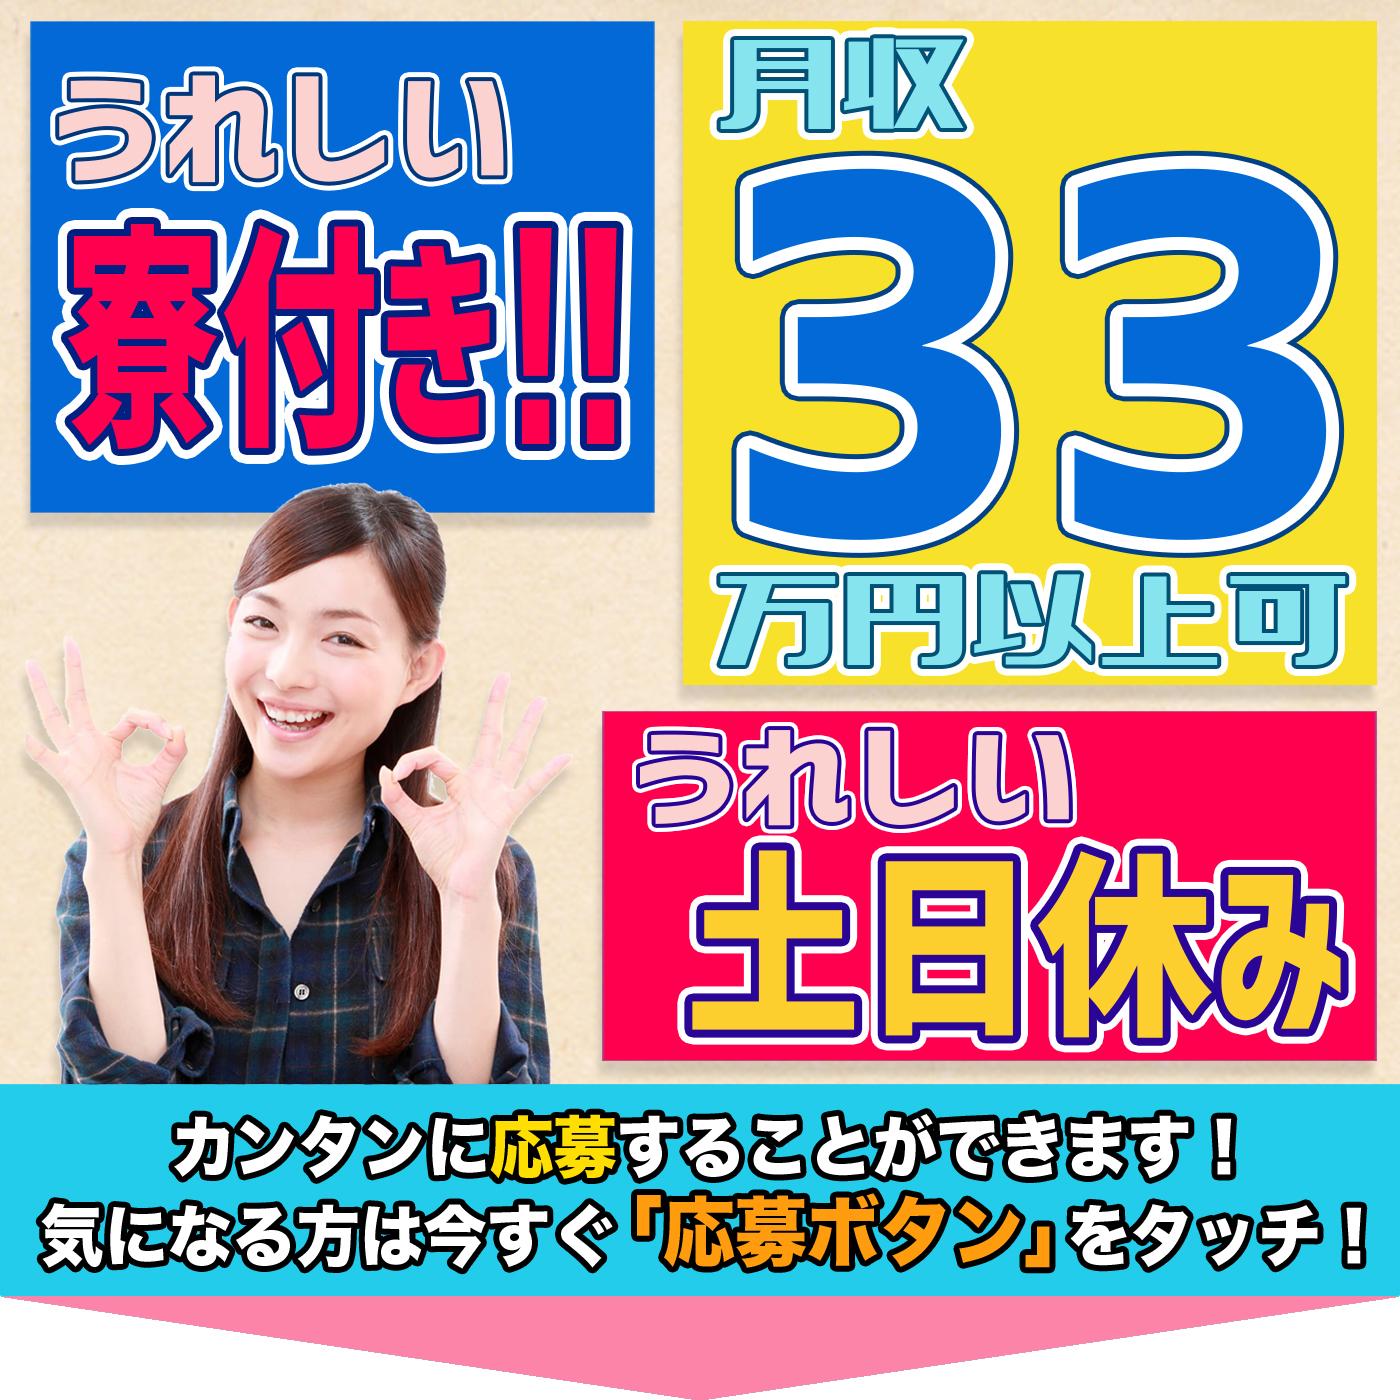 Kyujin32 ax 9